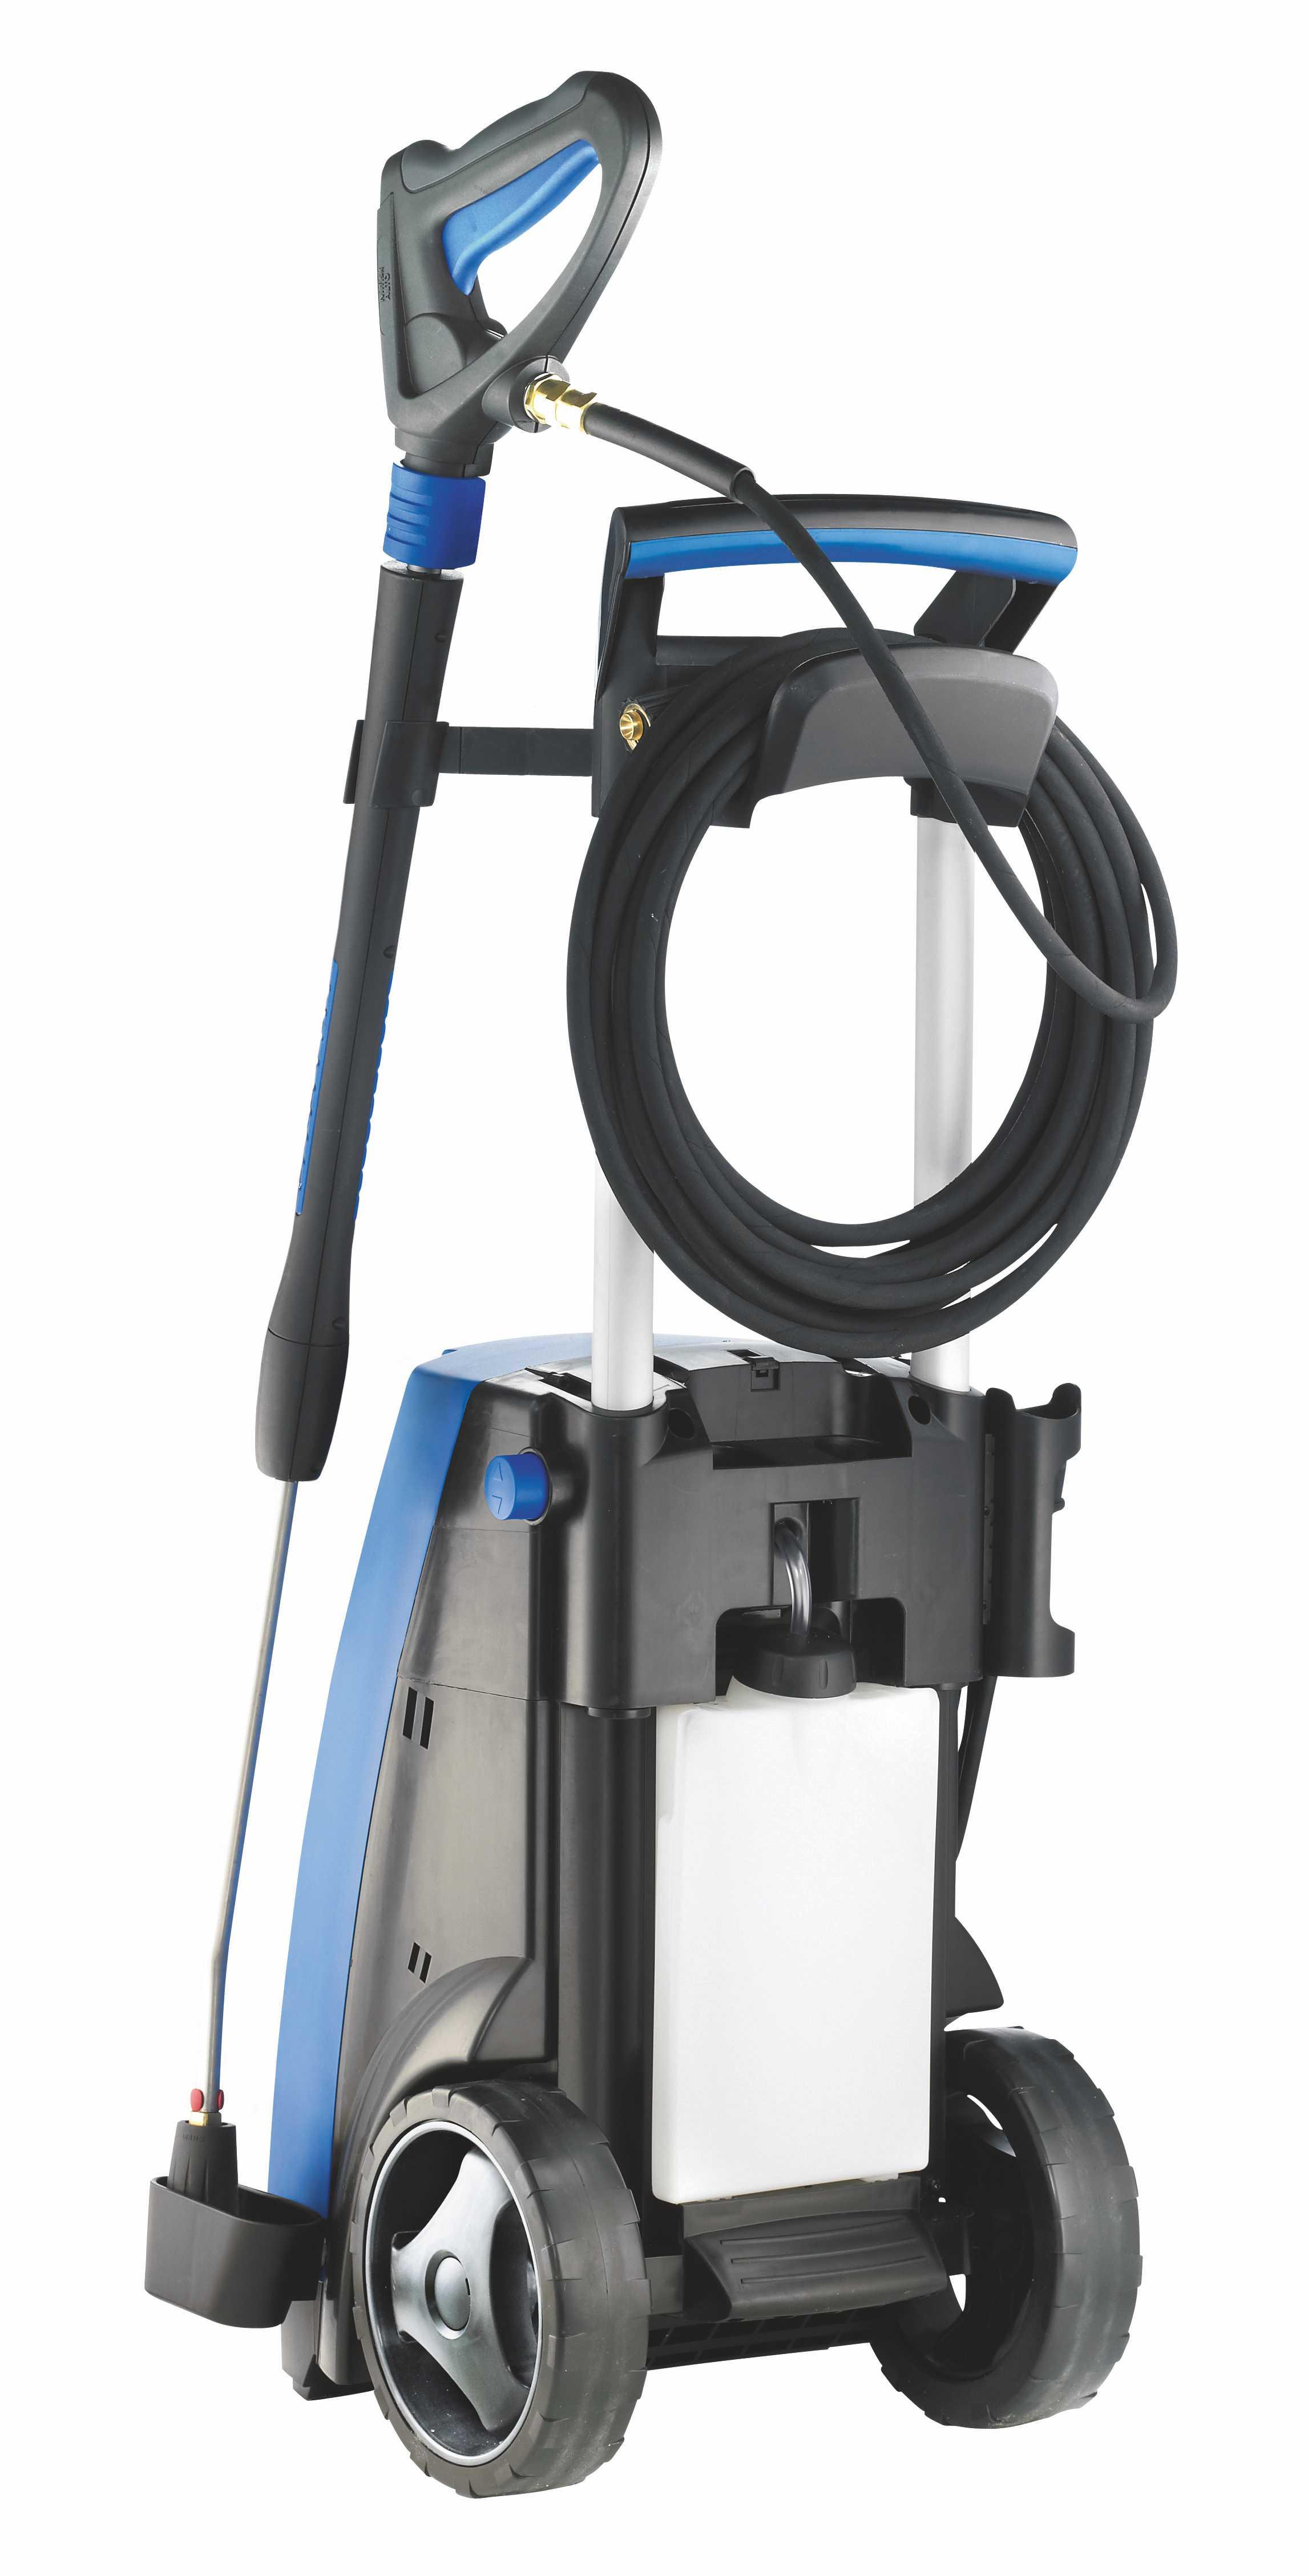 nilfisk mc 2c-150/650 xt hochdruckreiniger kaltwasser 230v